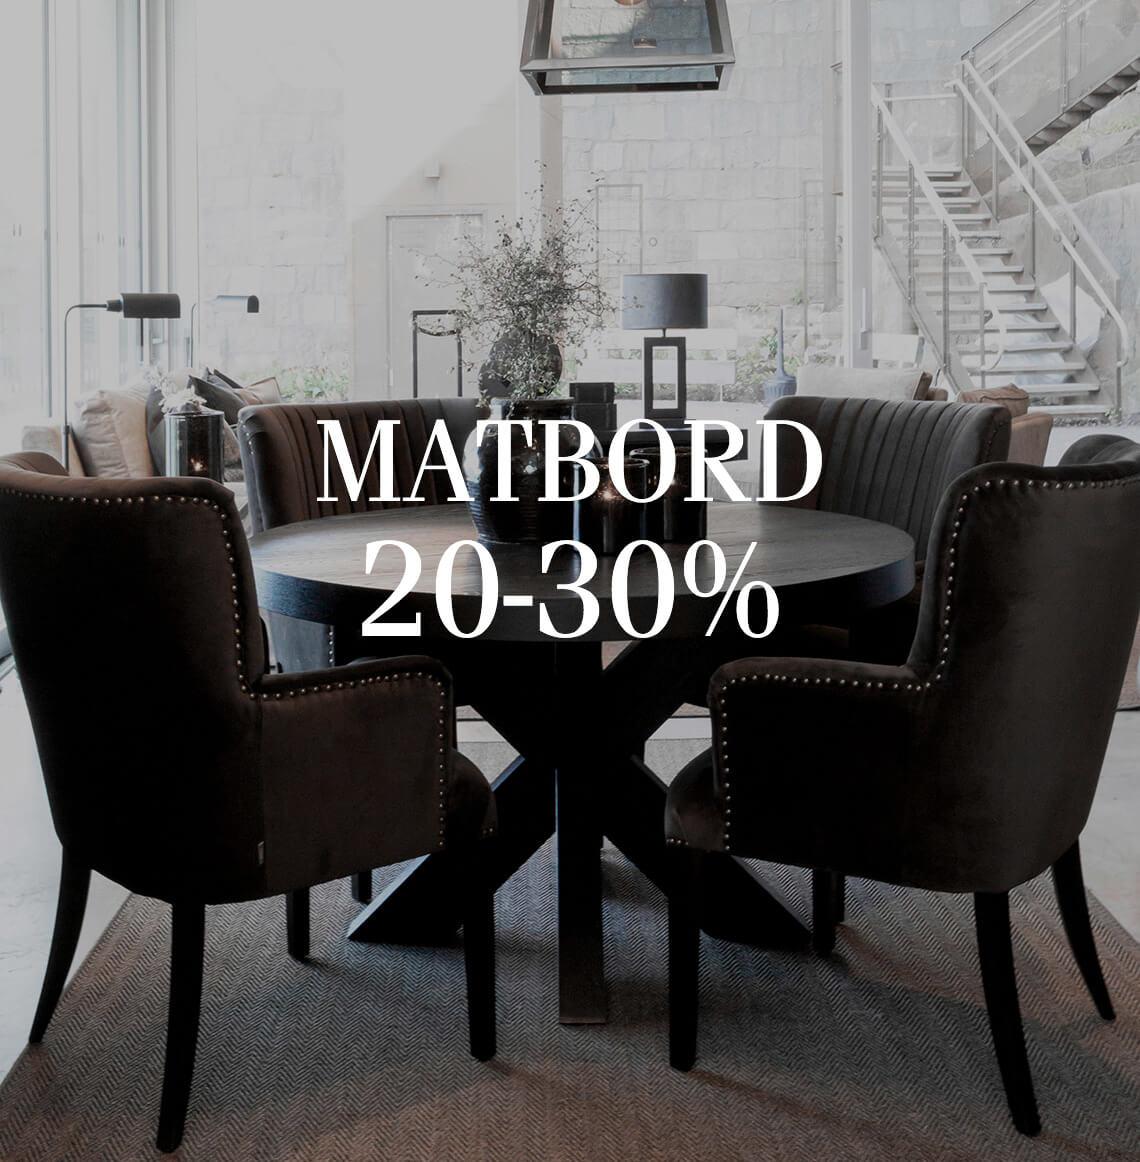 Matbord-text